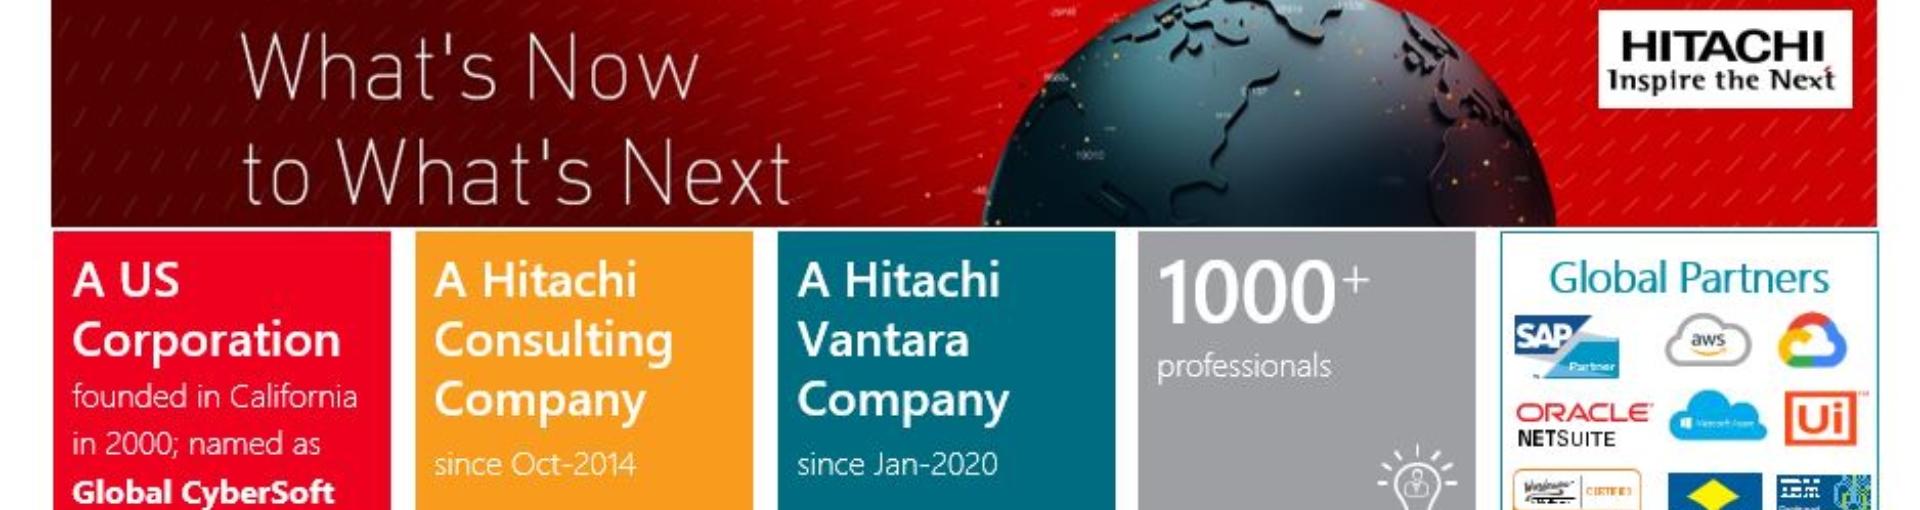 Open jobs at Hitachi Vantara Viet Nam